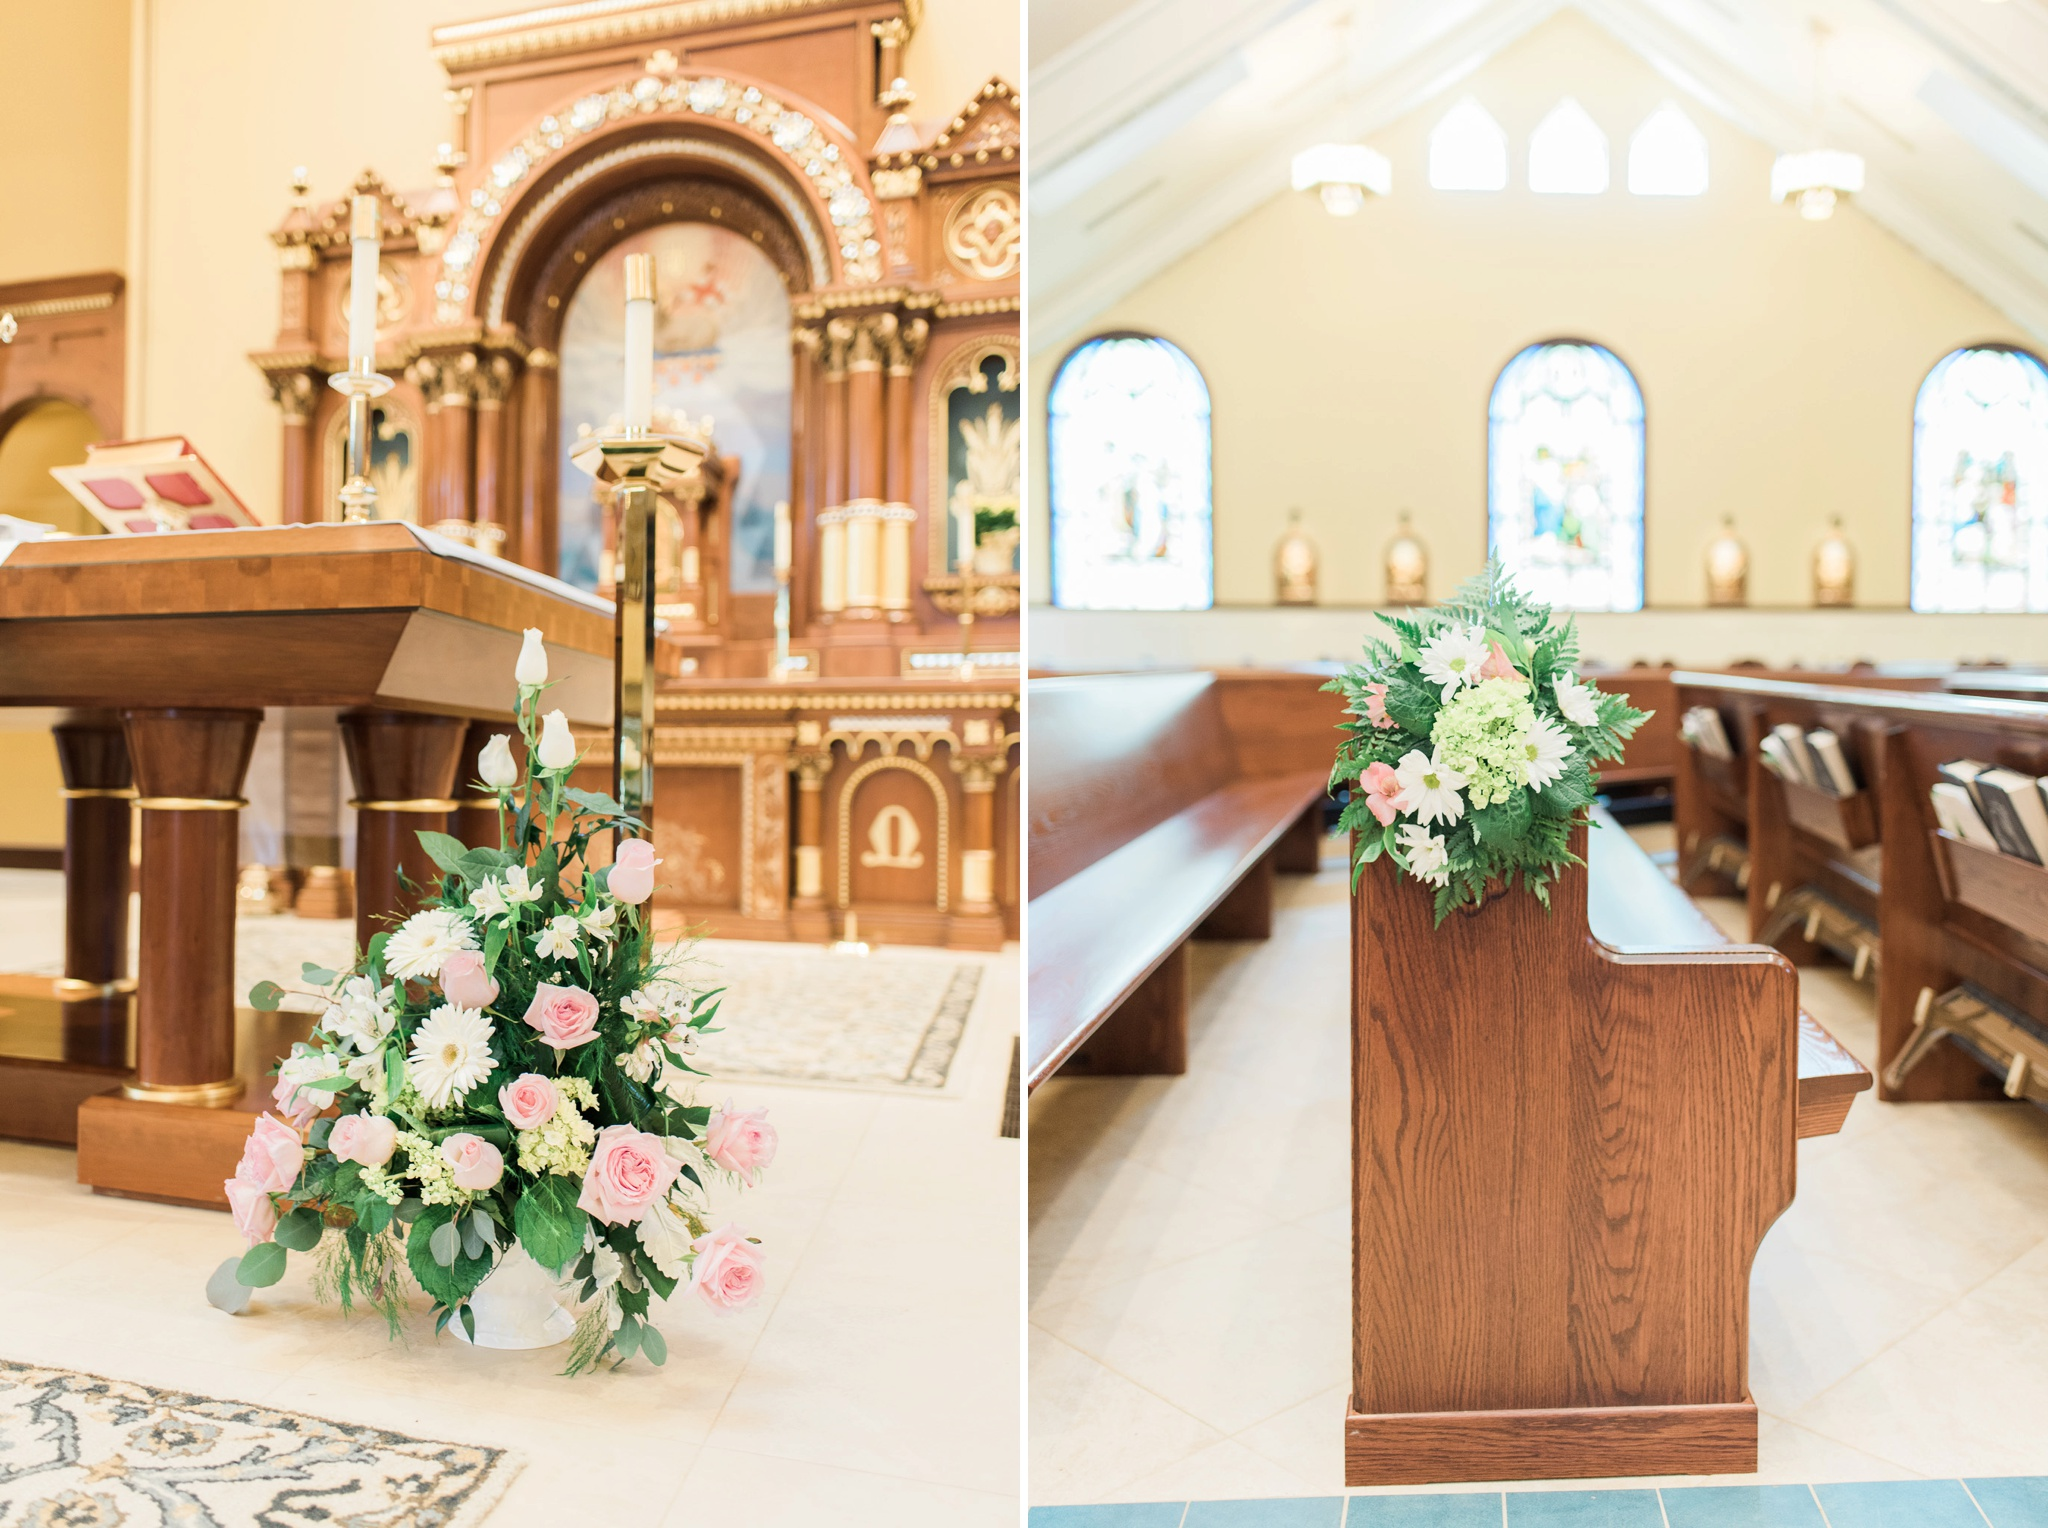 sunbury-ohio-wedding-hannah-johnathan_0021.jpg